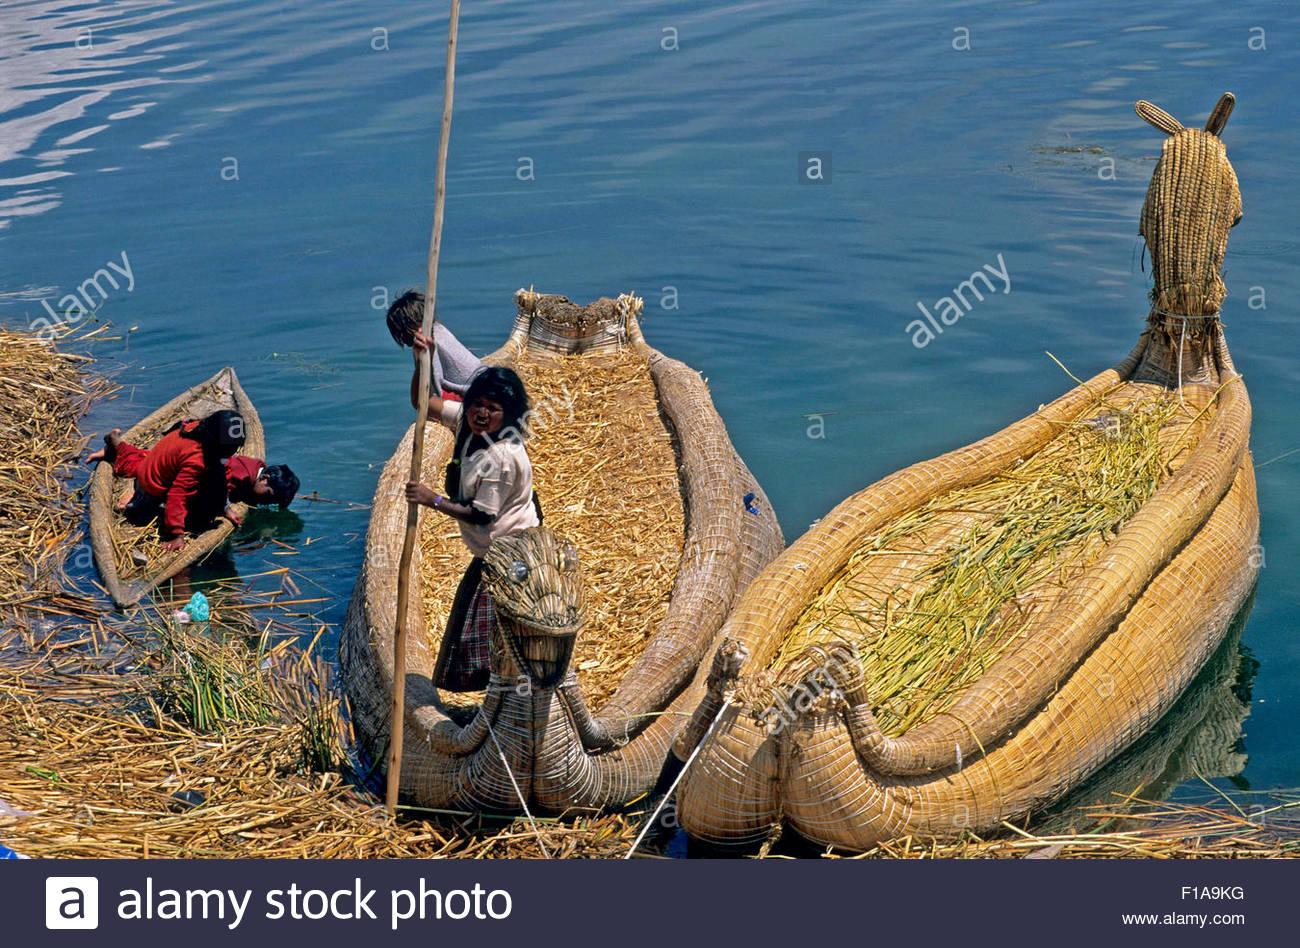 PERU / Puno / Lake Titicaca / Floating islands of the Uros / Uro woman harvesting reed - Stock Image